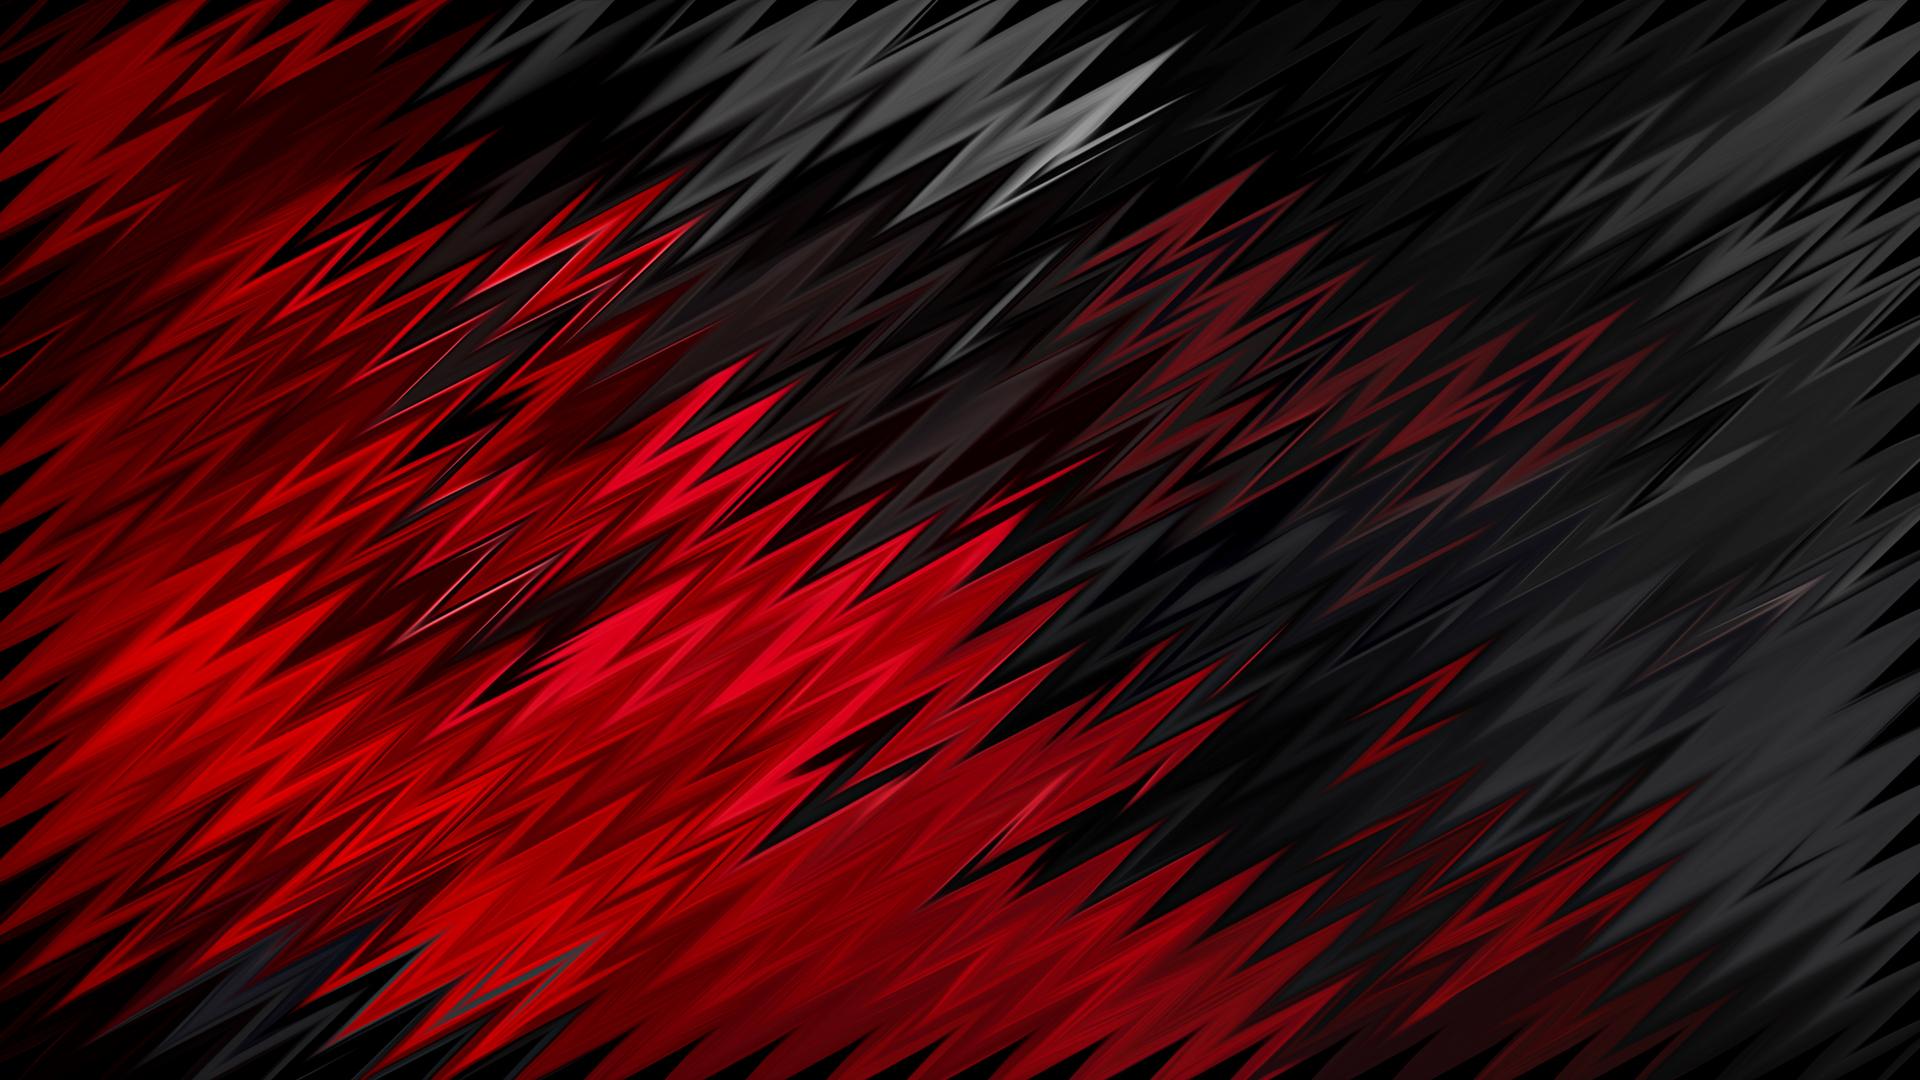 1920x1080 Red Black Sharp Shapes Laptop Full HD 1080P HD ...